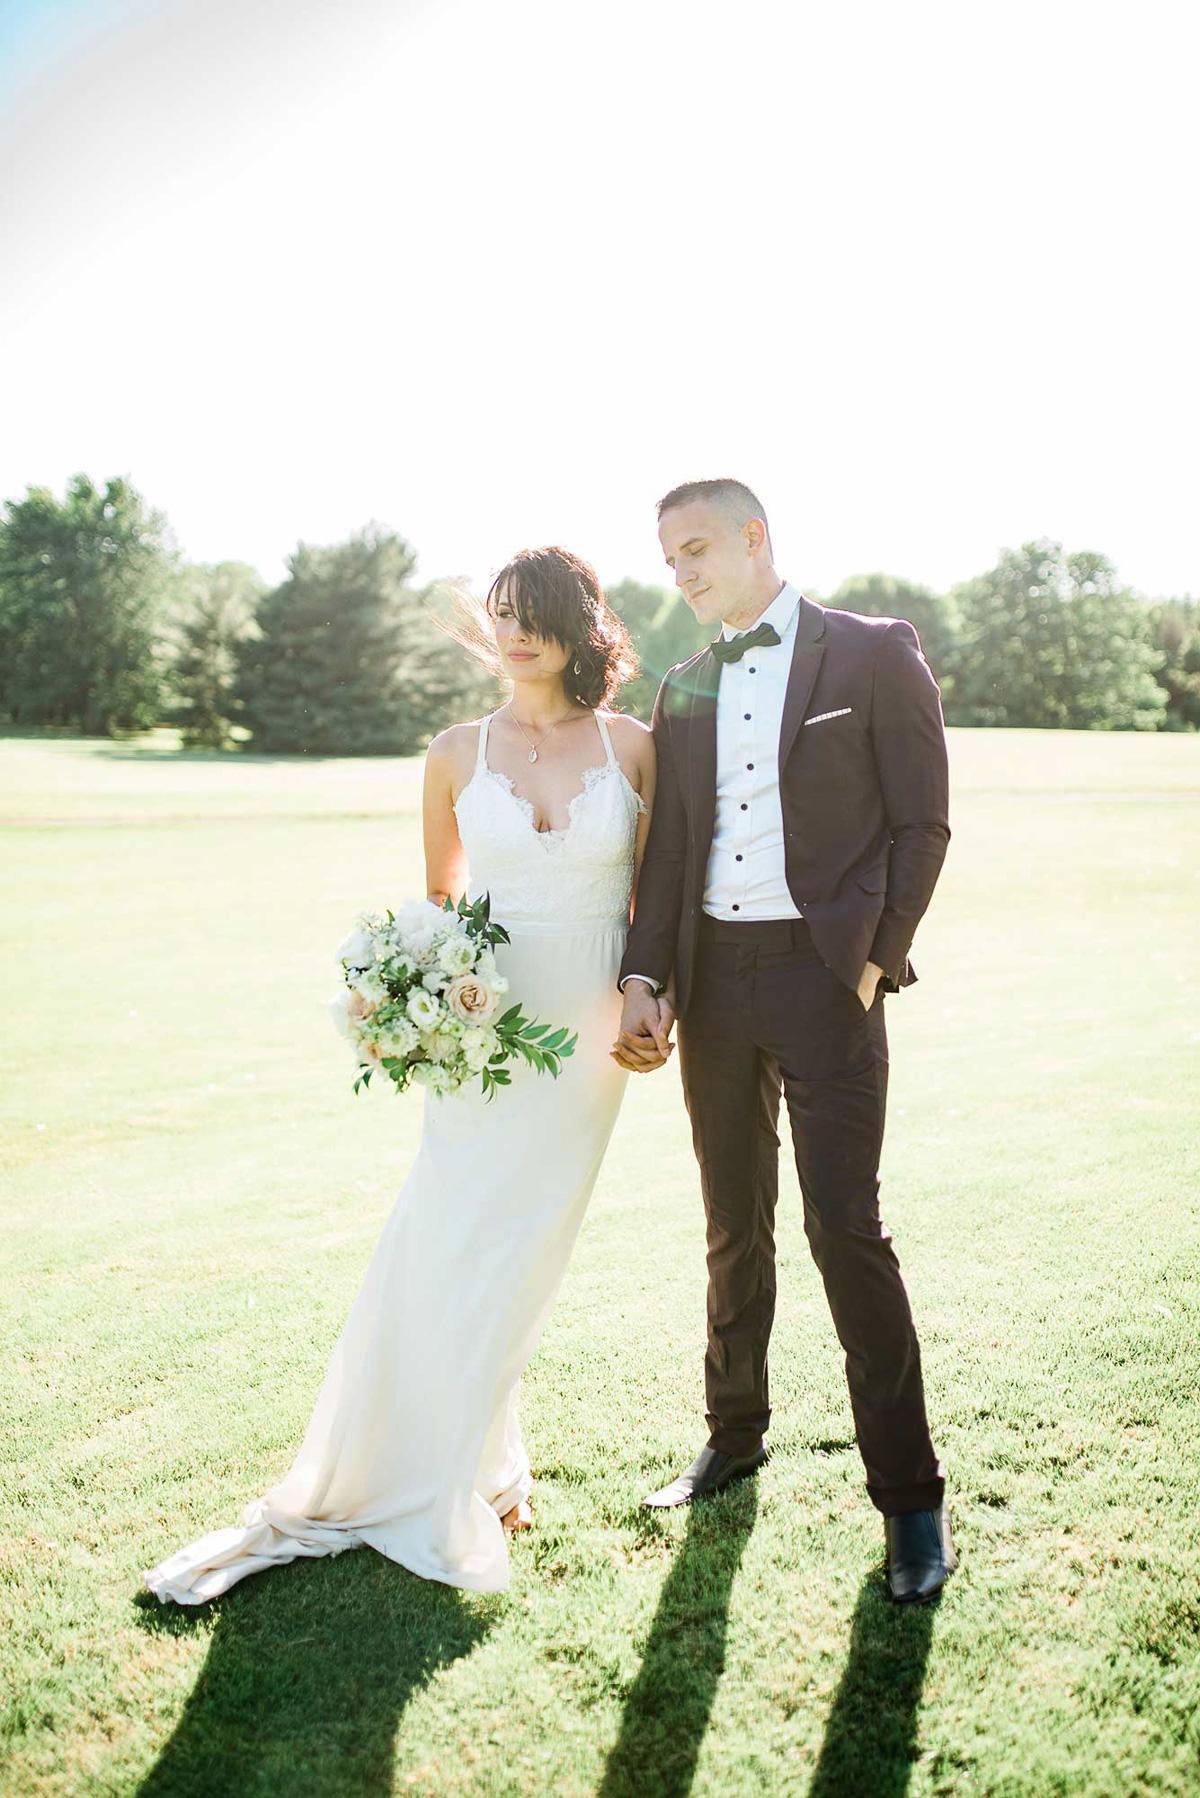 destiny-dawn-photography-vineyard-bride-swish-list-knollwood-golf-and-country-club-ancaster-wedding-editorial-16.jpg